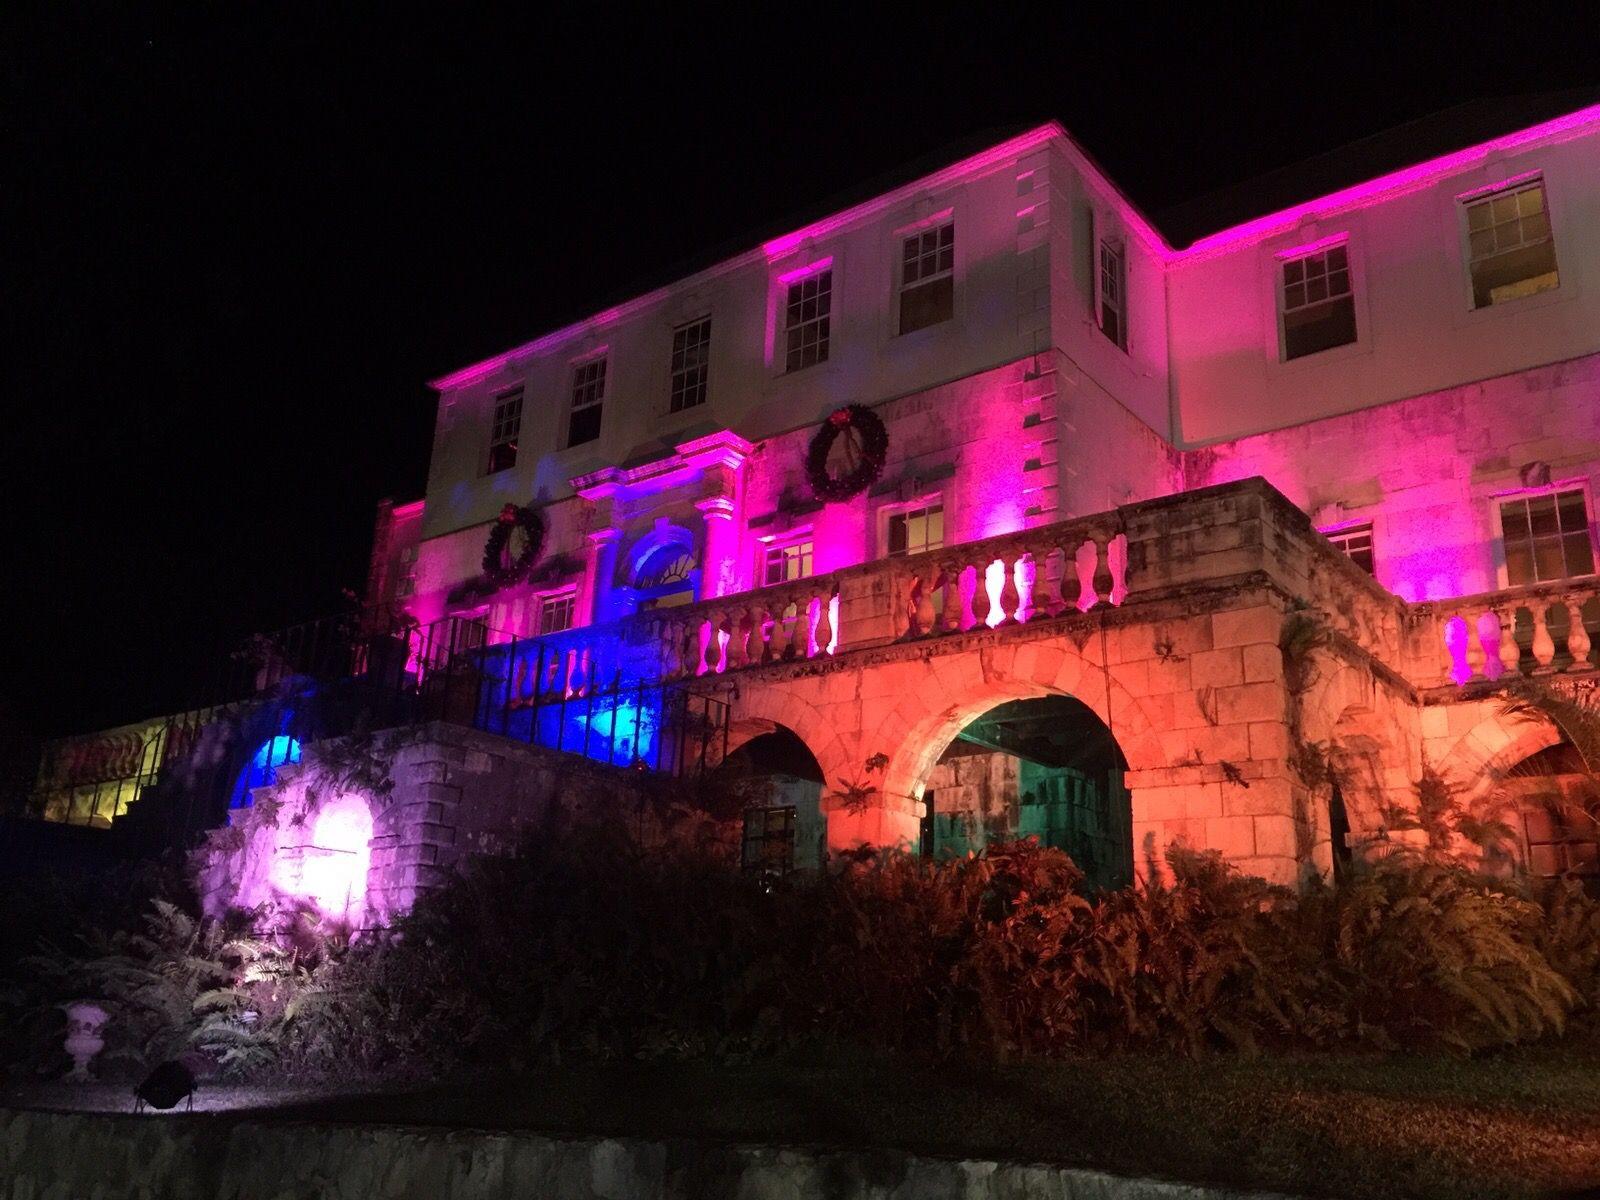 Uplighting at the Greathouse! #TeamJWDJ #JamaicaWeddingDJ #reggaetech #weddings #events #outdoor #DJVaun